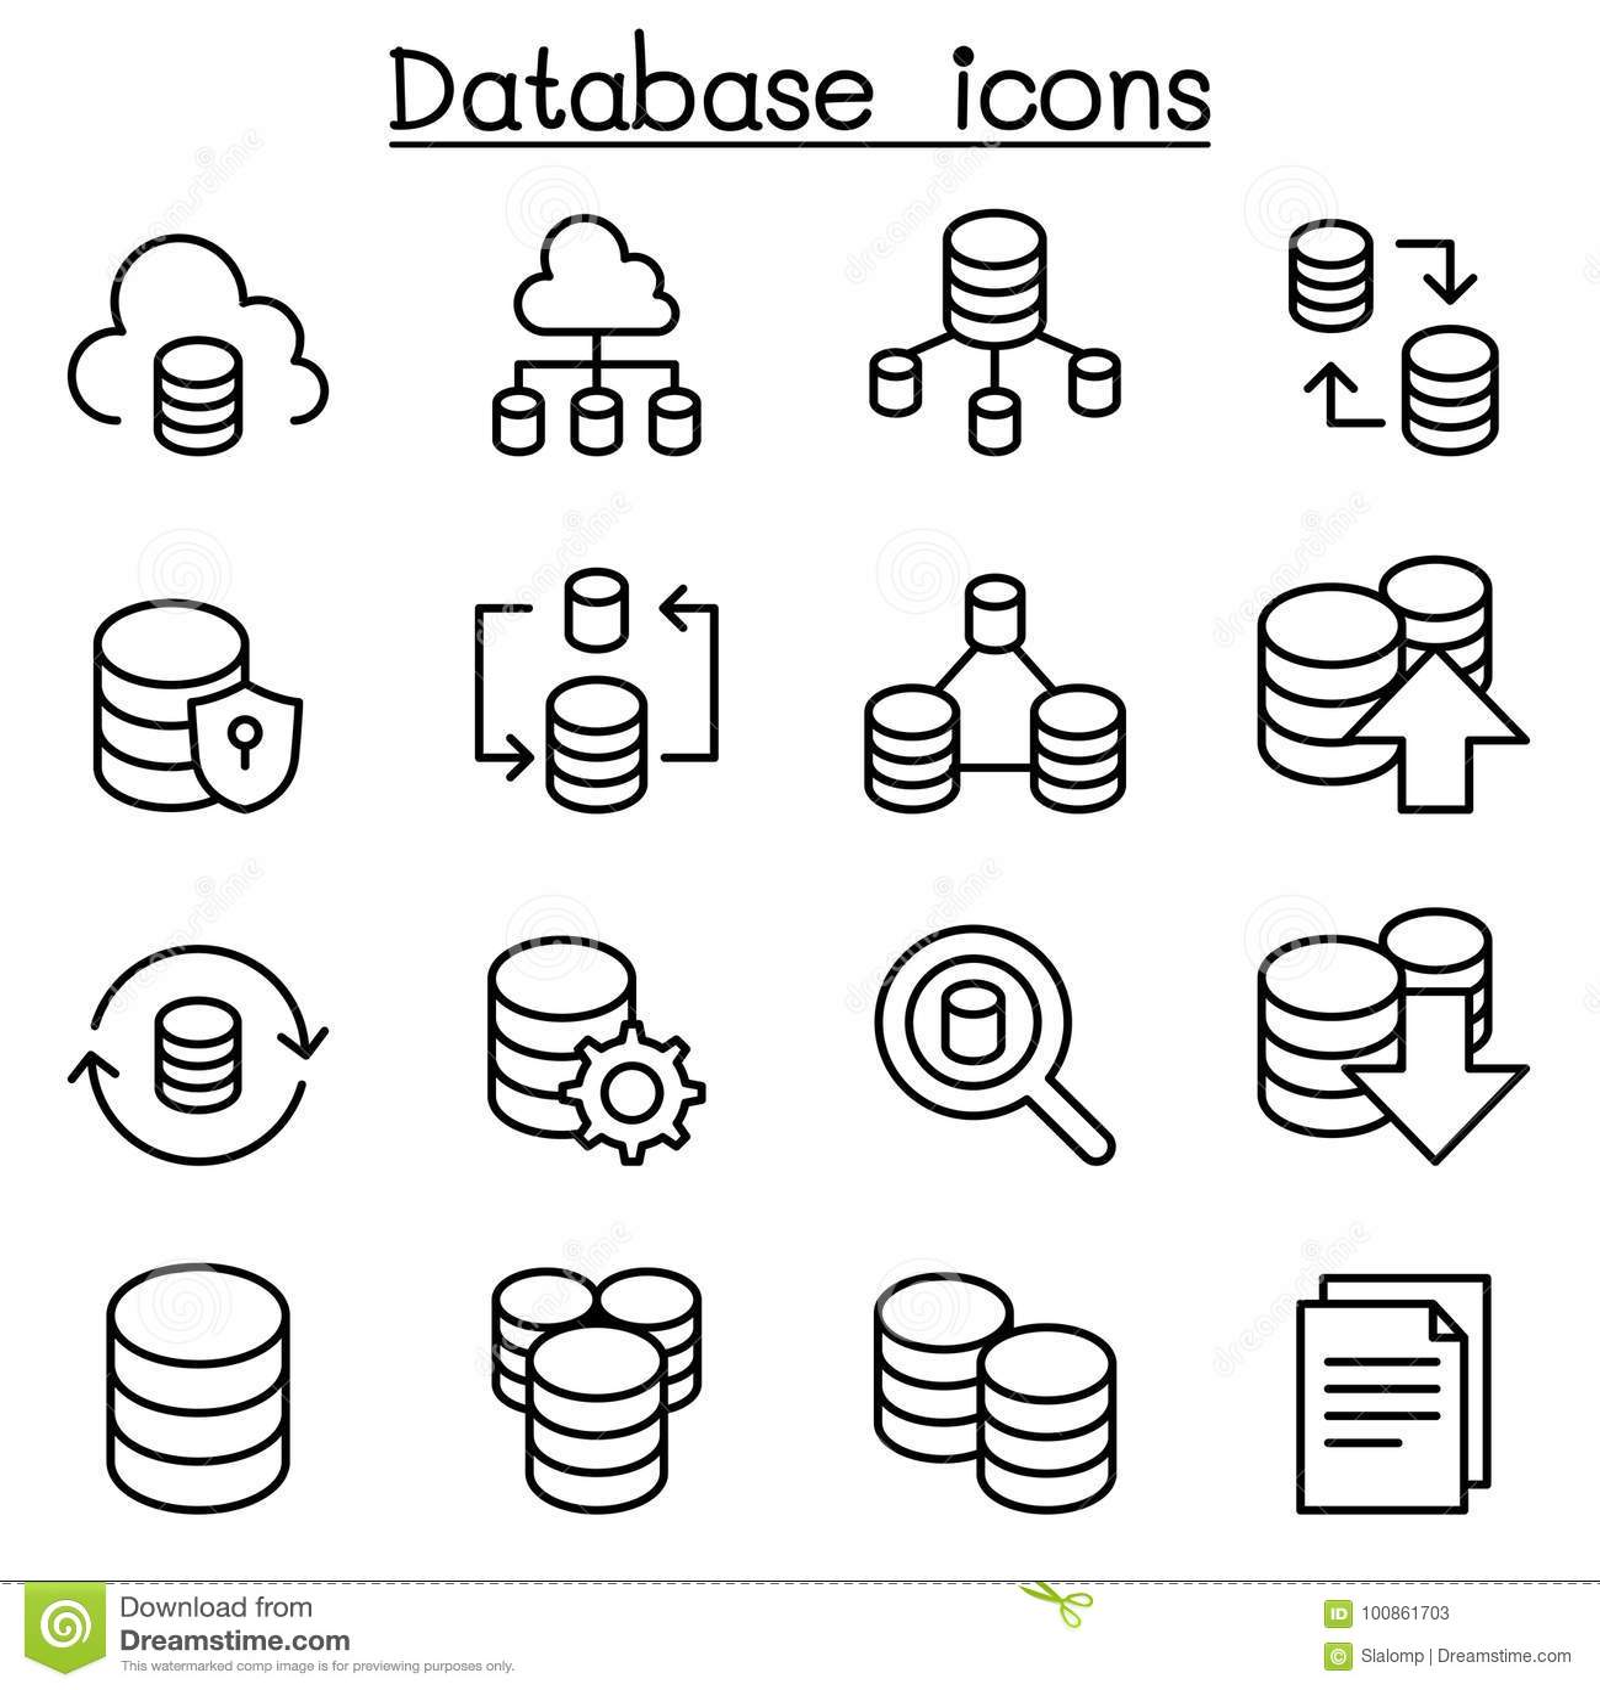 Server, Database, Hosting, Sharing, Cloud Computing Icon